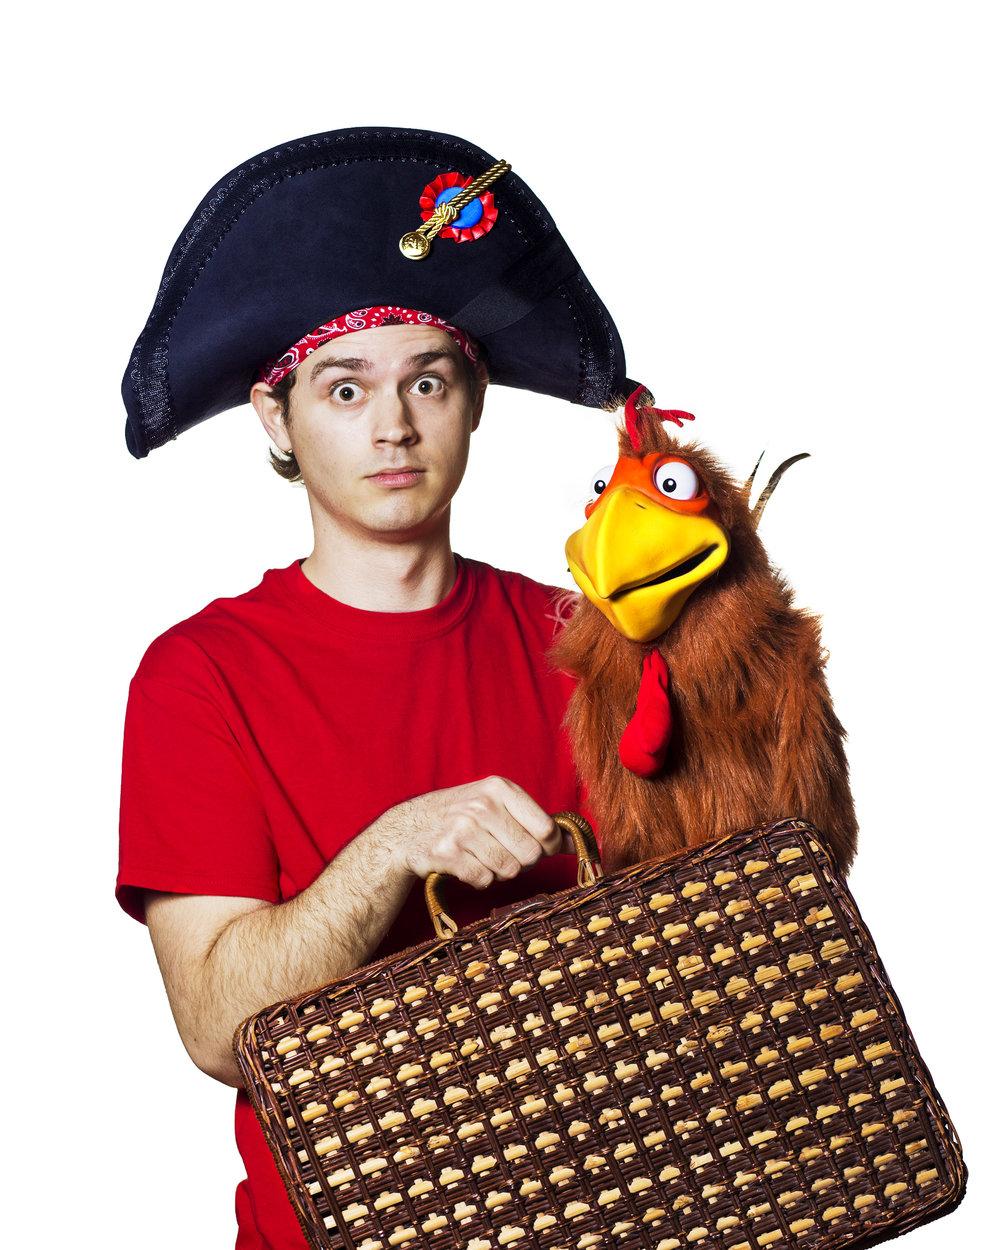 4-Humphrey and Pirate.jpg